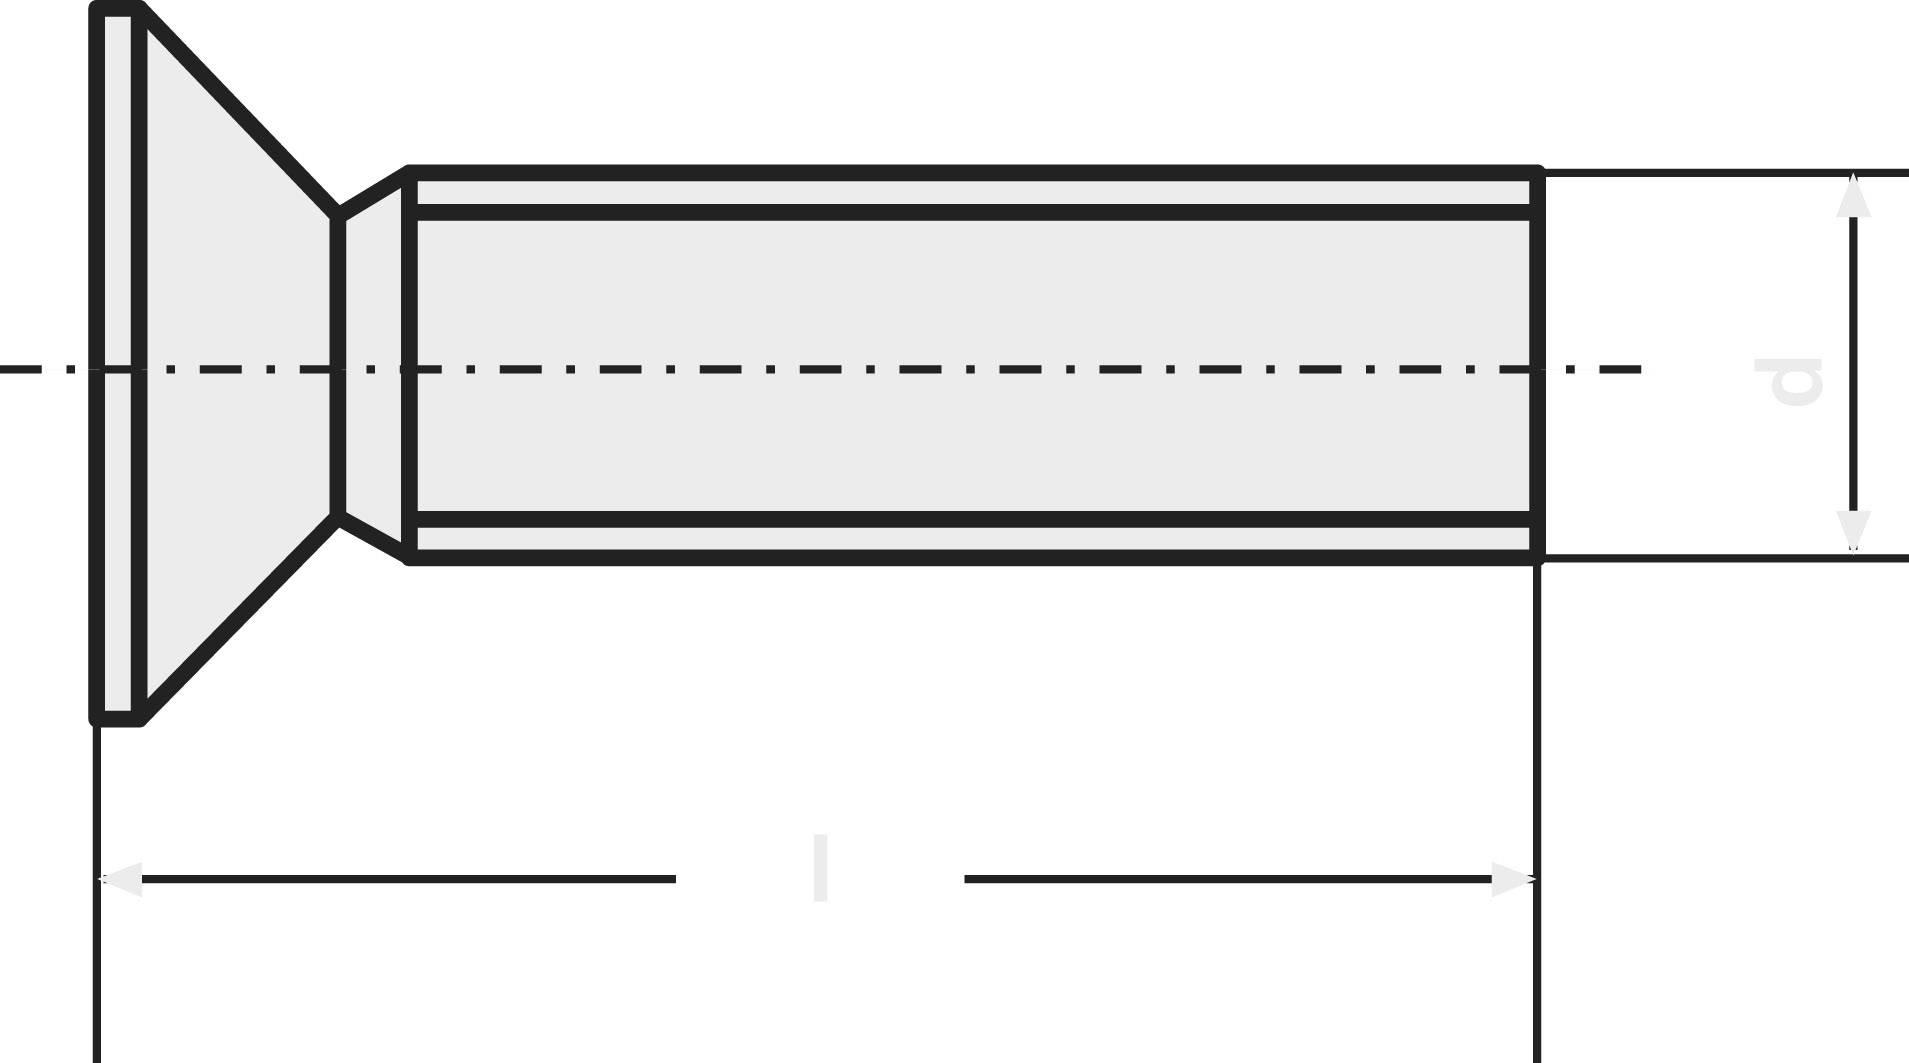 Sortiment-Senkkopfschrauben mit Kreuzschlitz DIN 965 M1,6 Edelstahl A2 500 Teile